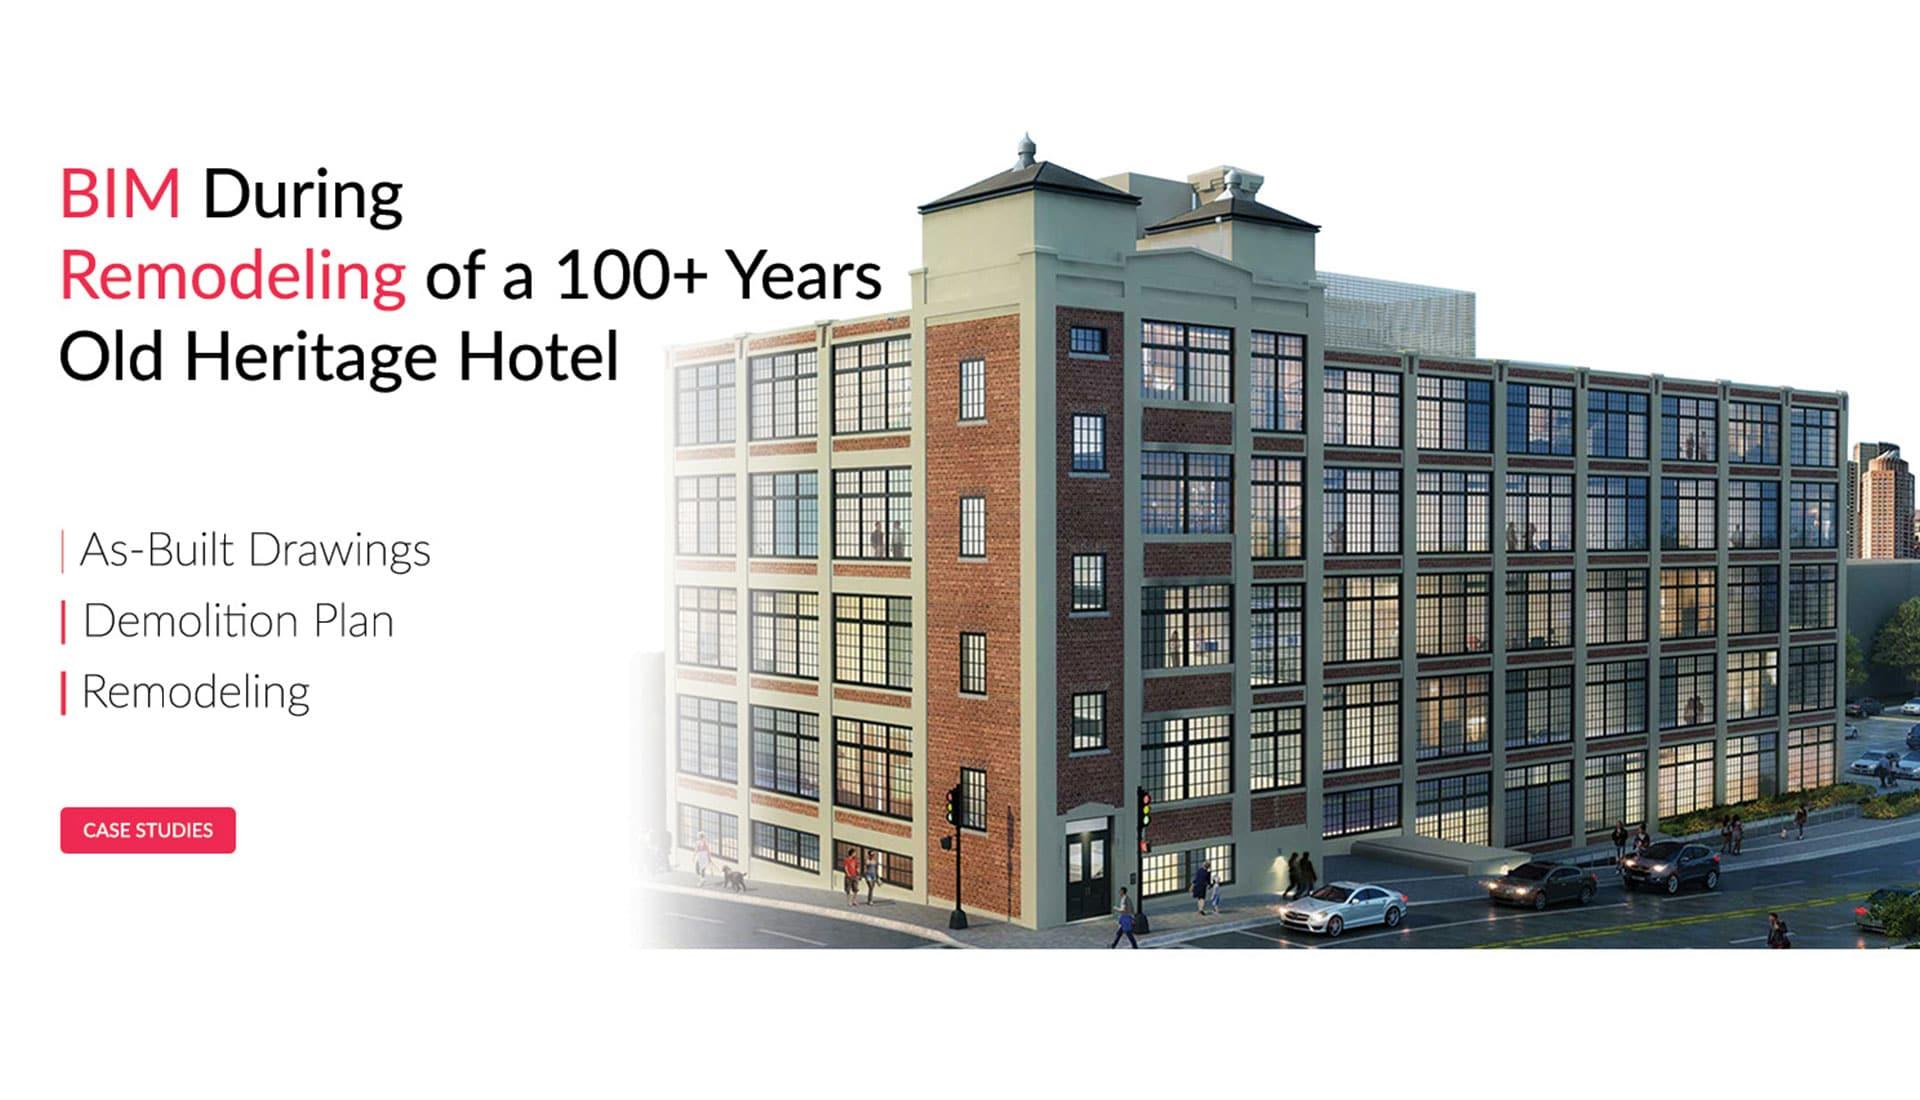 BIM-During-Hotel-Remodeling-Case-Study